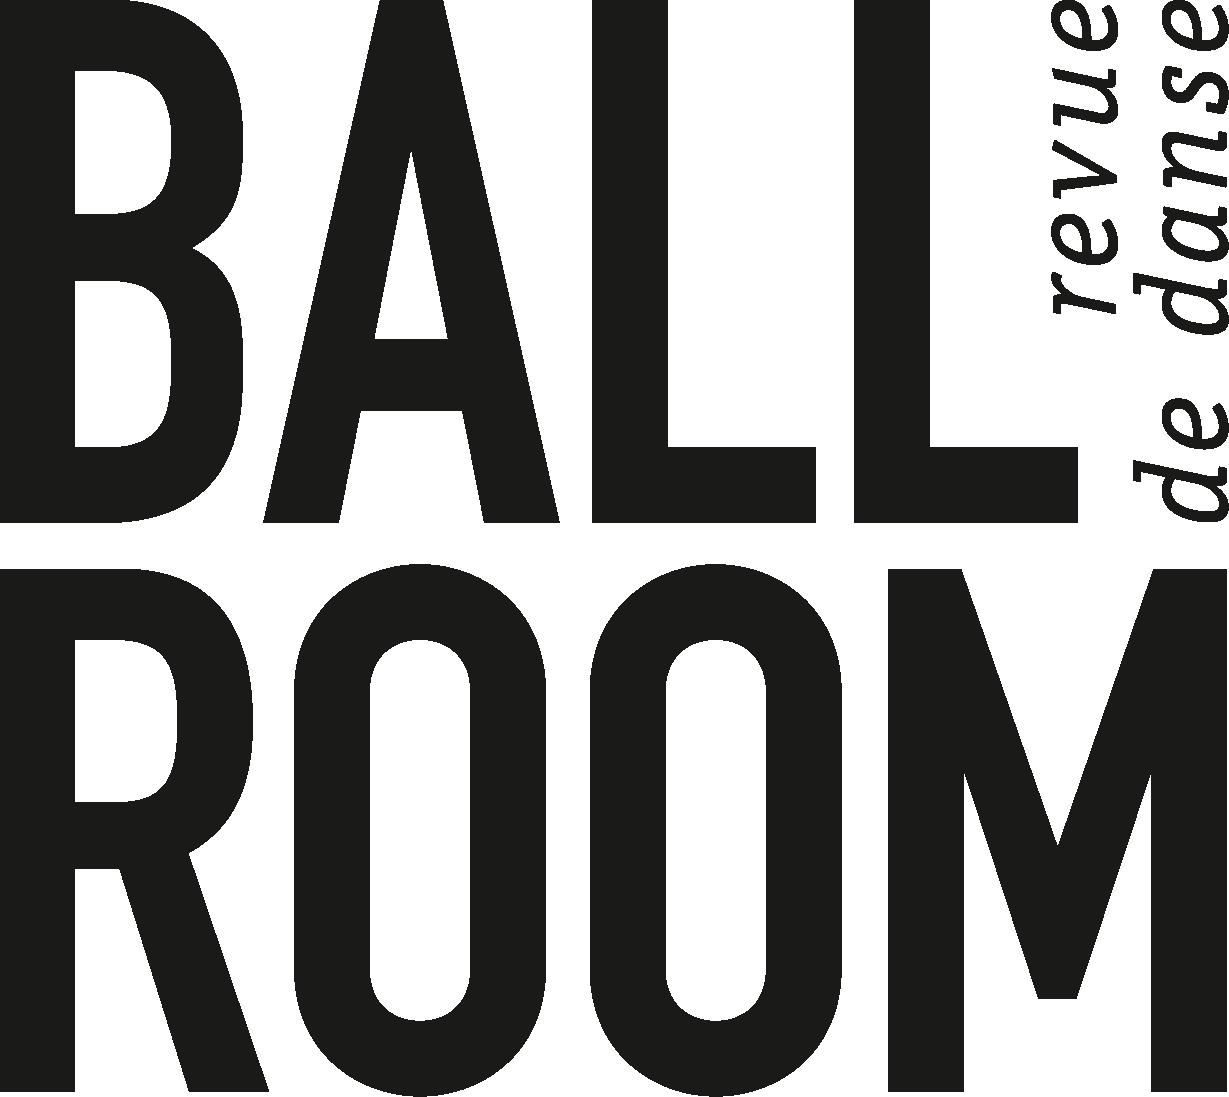 logo-ballroom